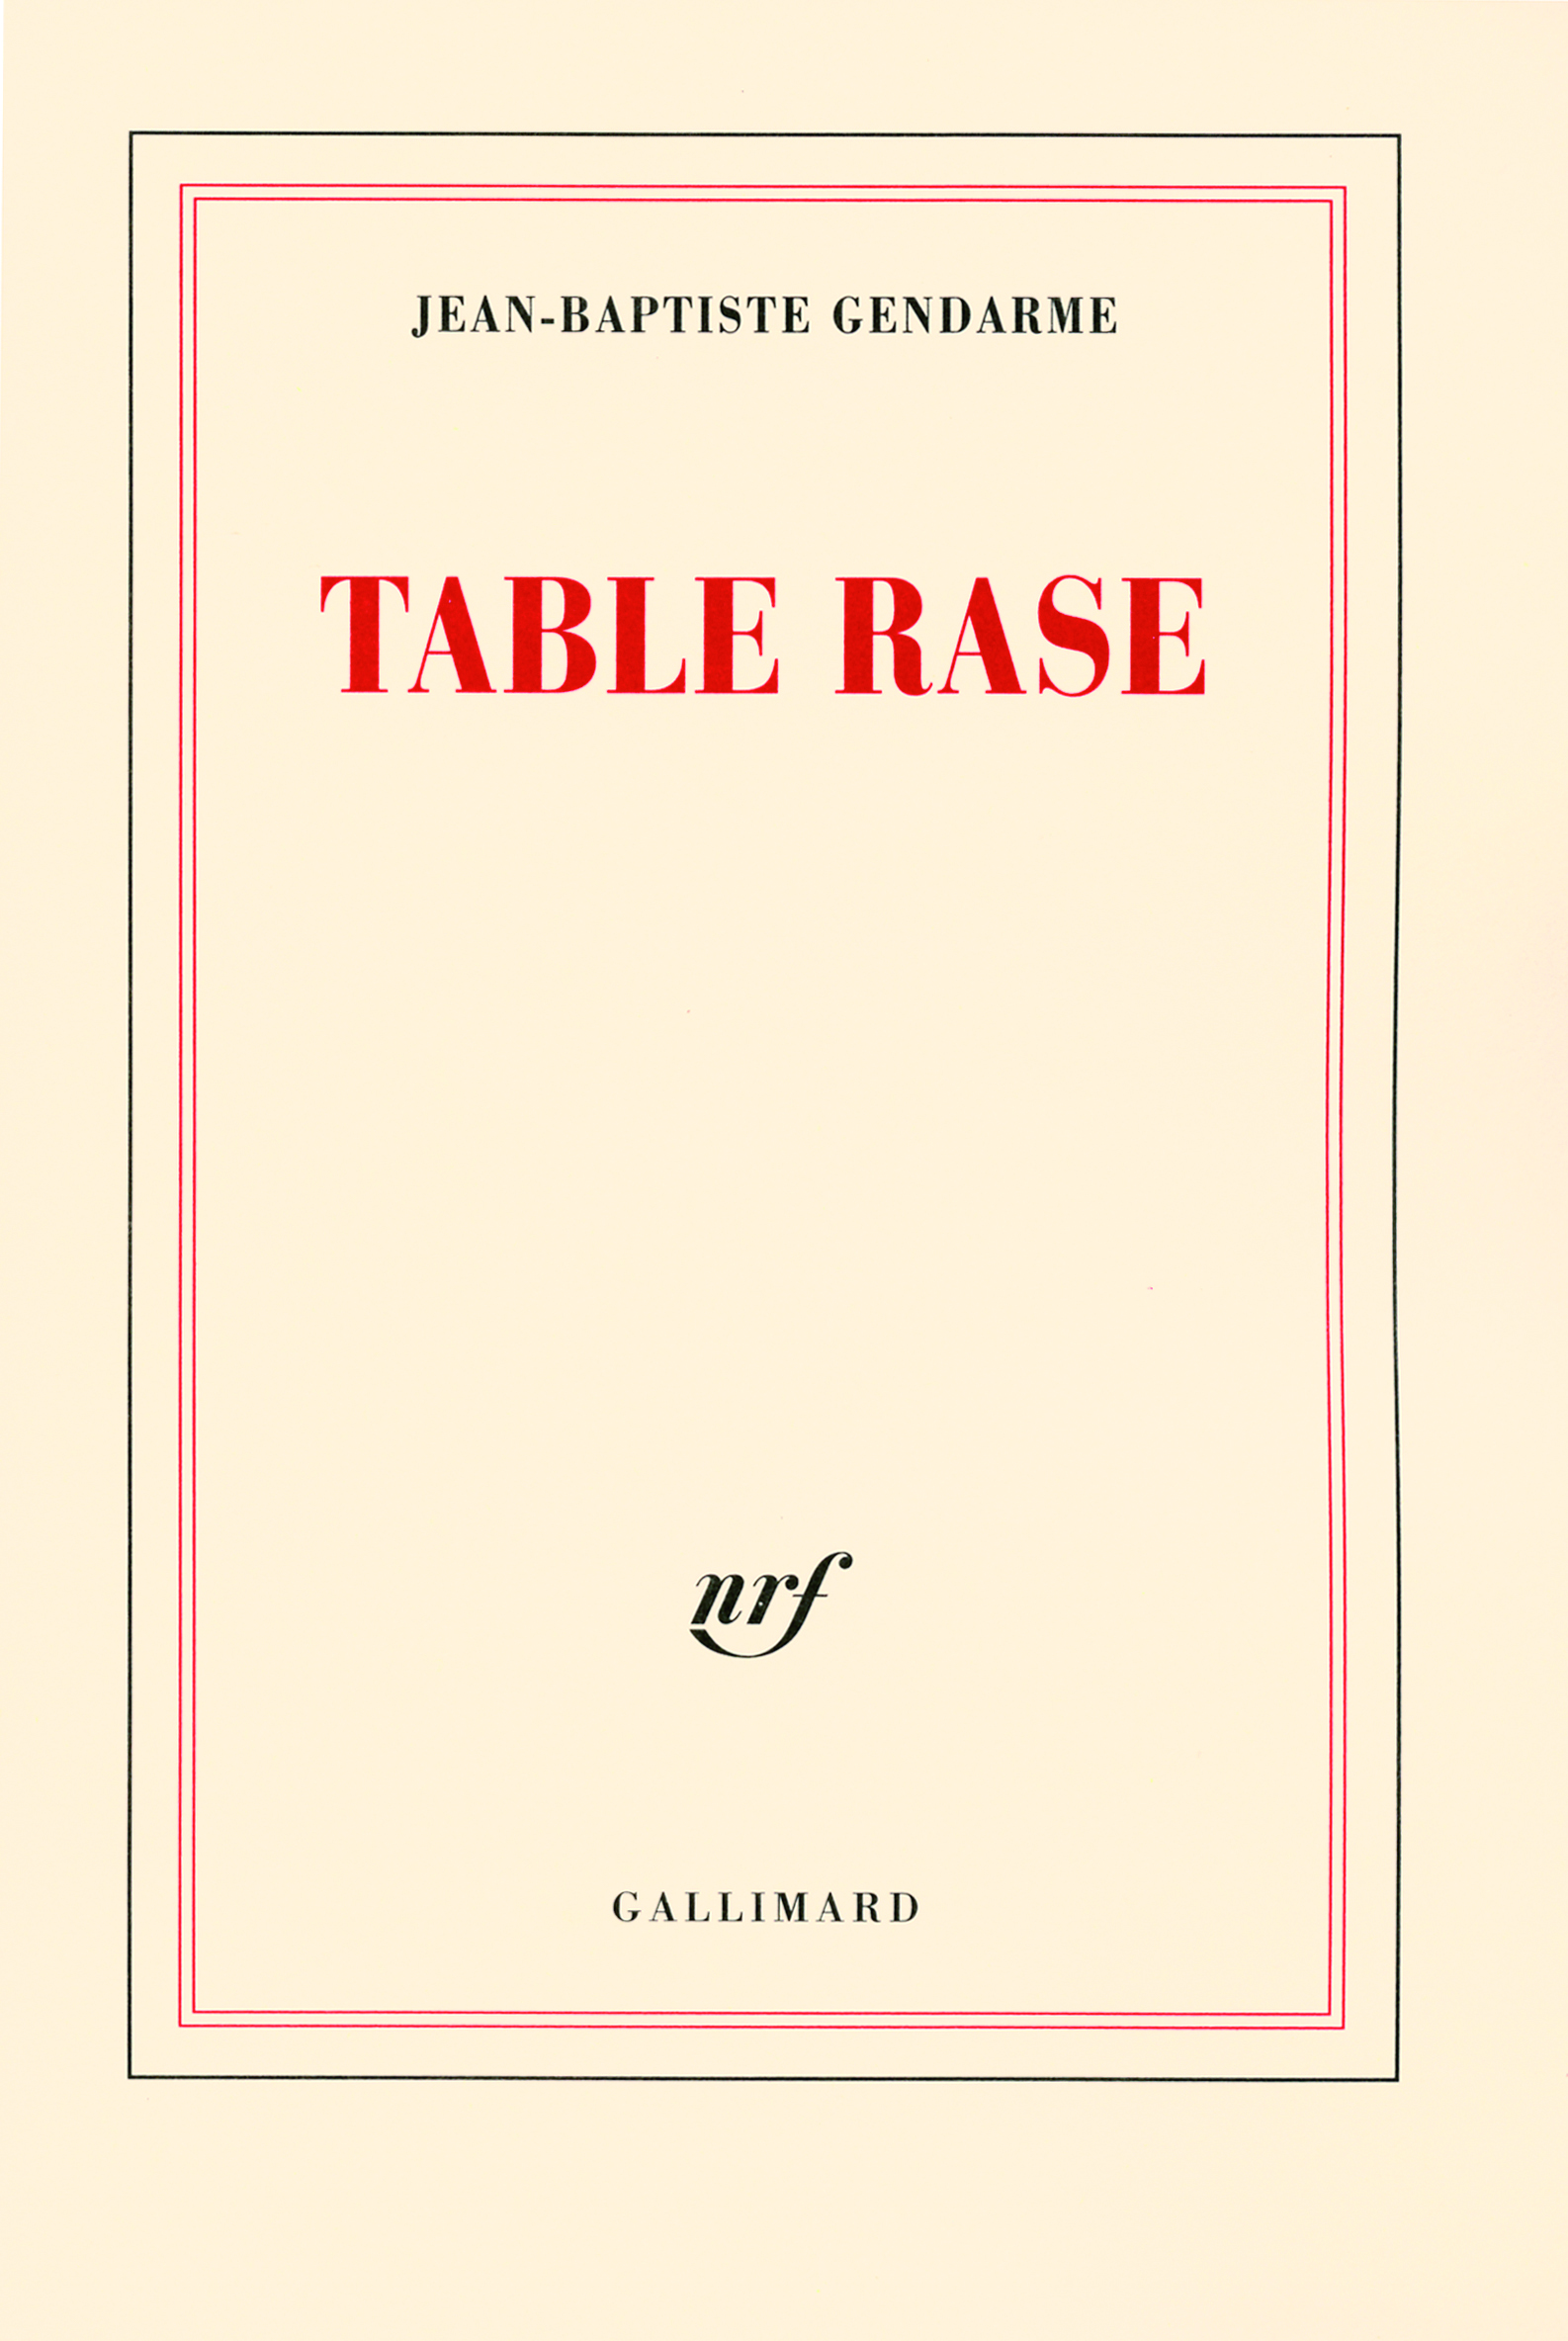 TABLE RASE ROMAN